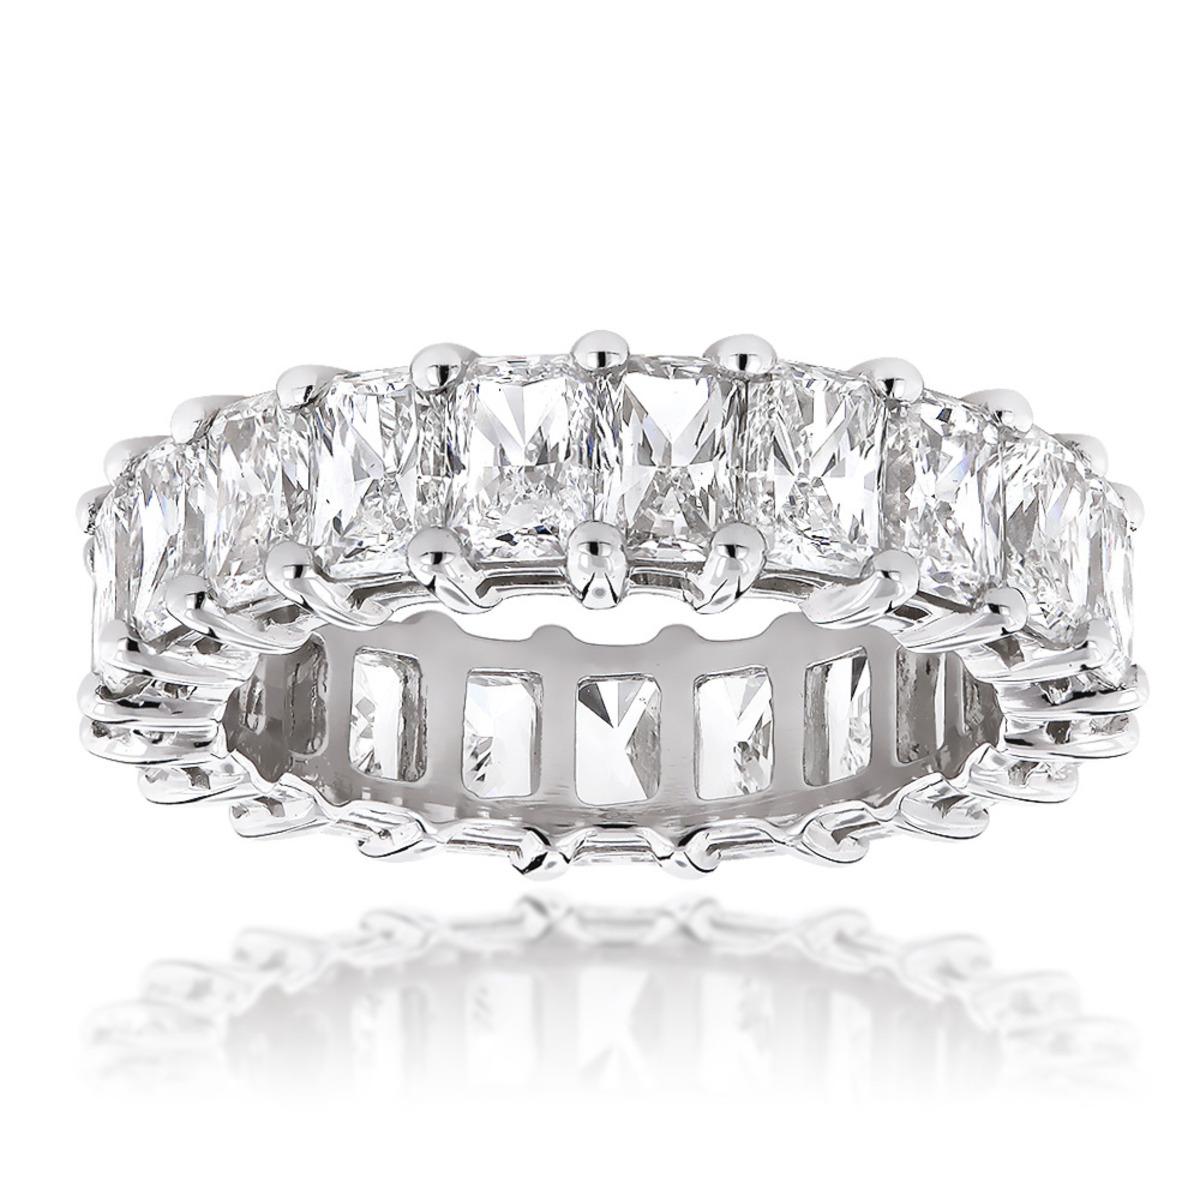 Platinum Radiant Cut Diamonds Eternity Band G/VS 6.6 Carat Anniversary Ring